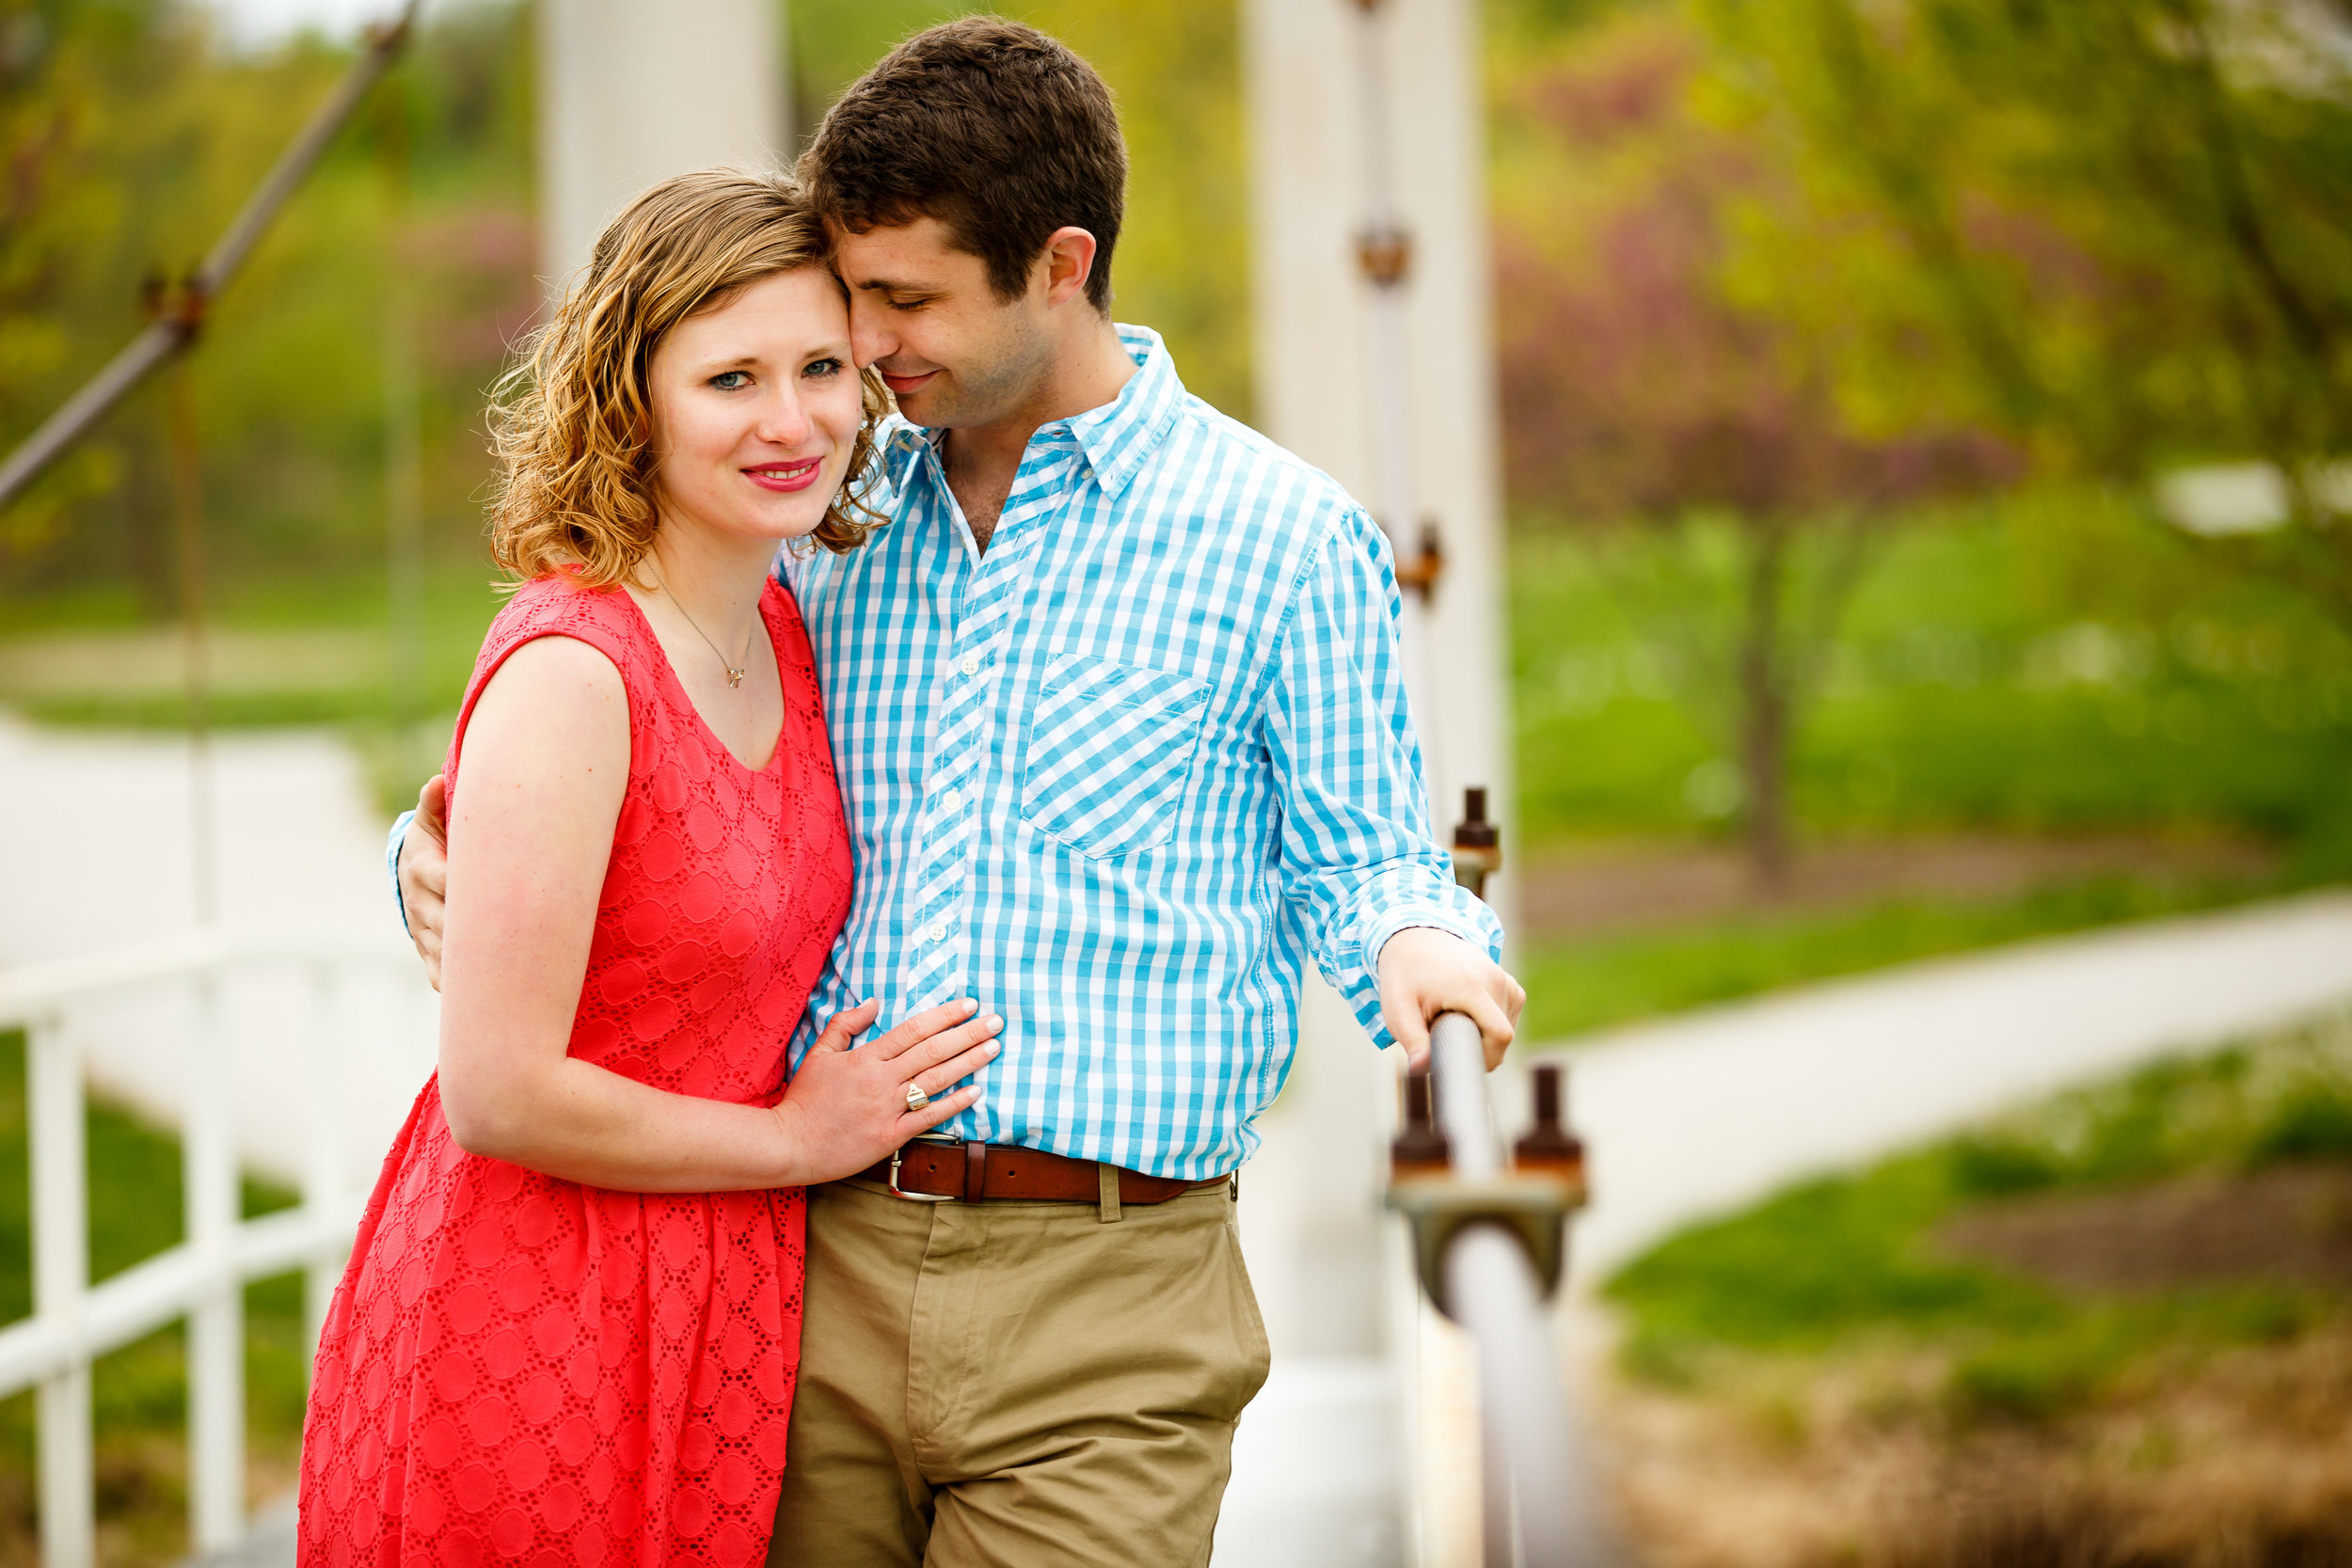 Art Hill Forest Park Engagement Photos Oldani Photography St. Louis Wedding Photographers11.jpg